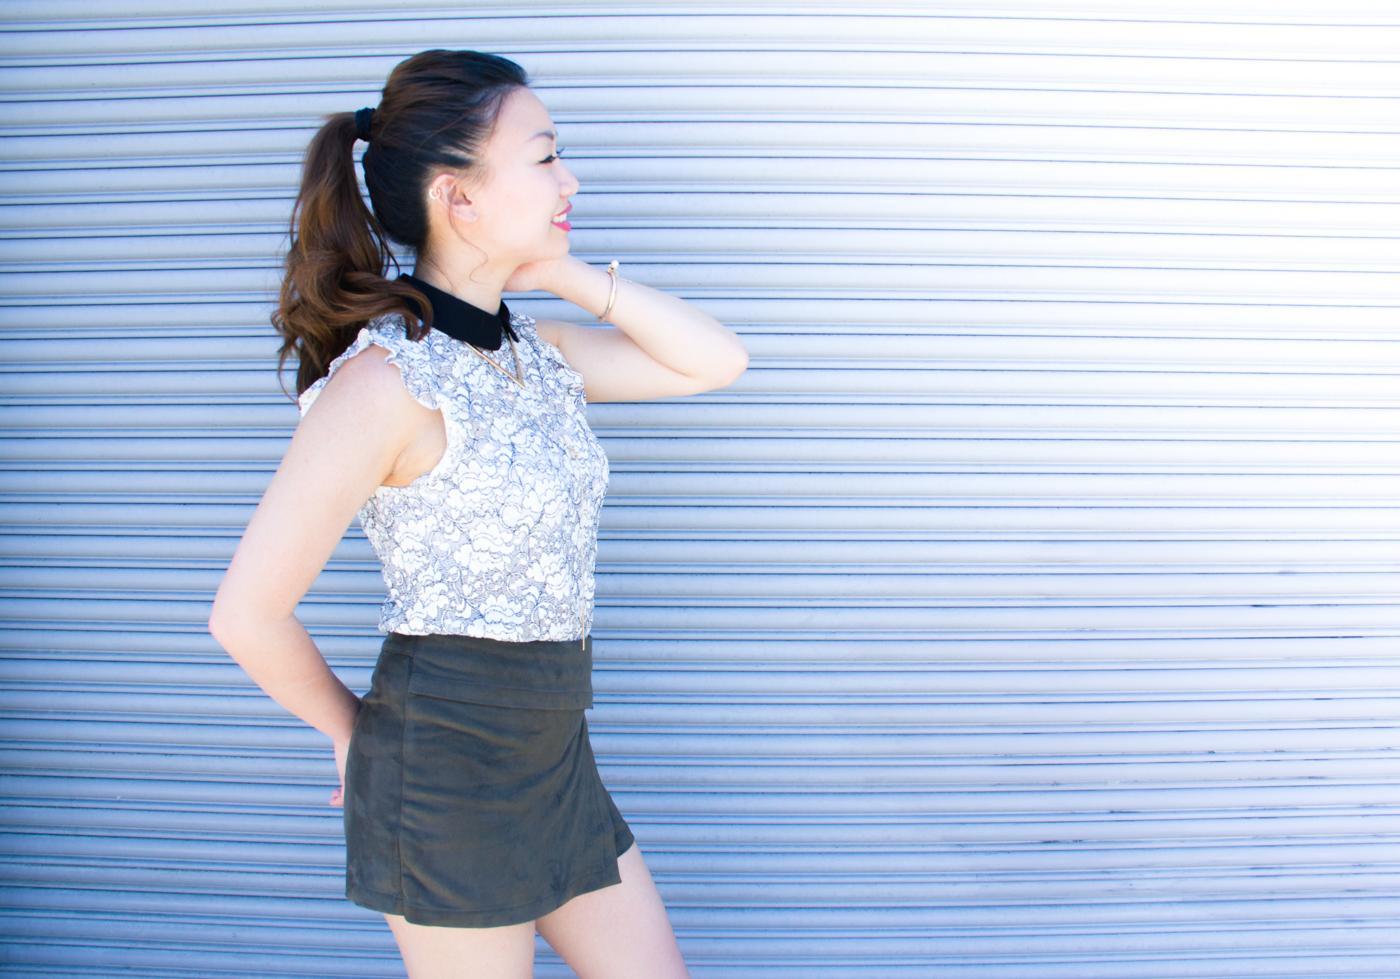 Zara lace top | via The Chic Diary